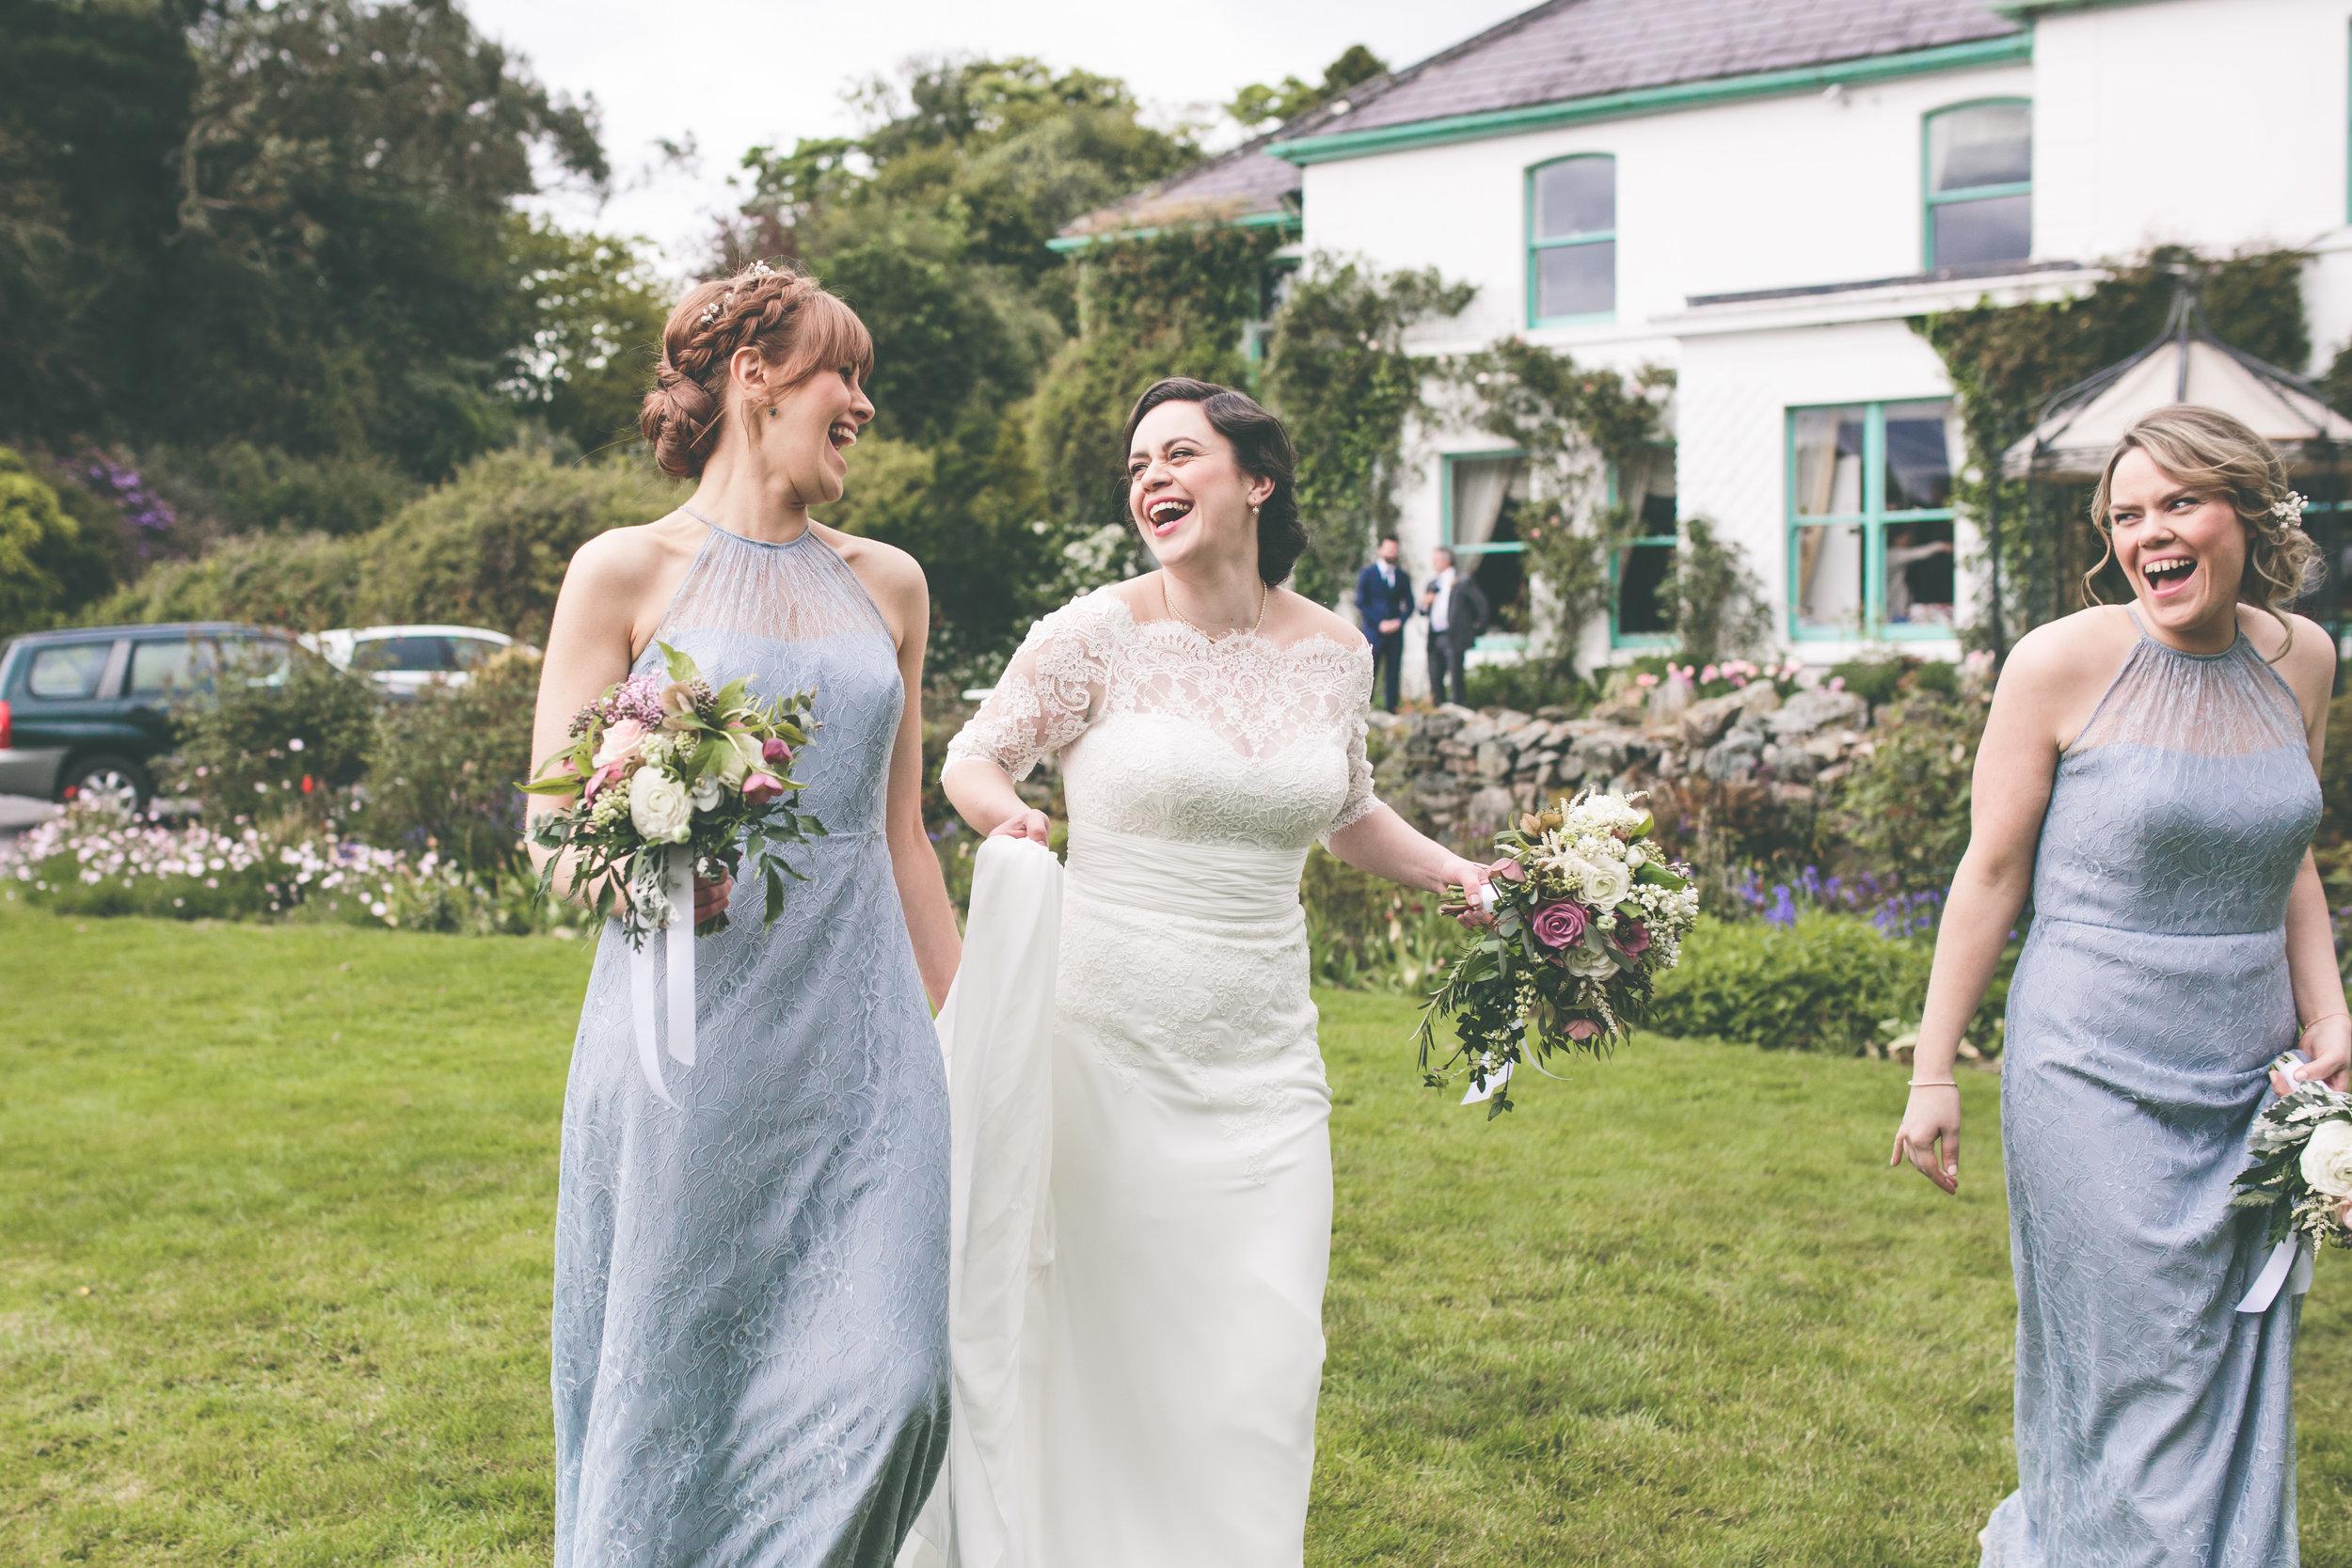 Anna_Mark_Cashel_Connemara_Olivia_Moon_Wedding_Photography-254.jpg